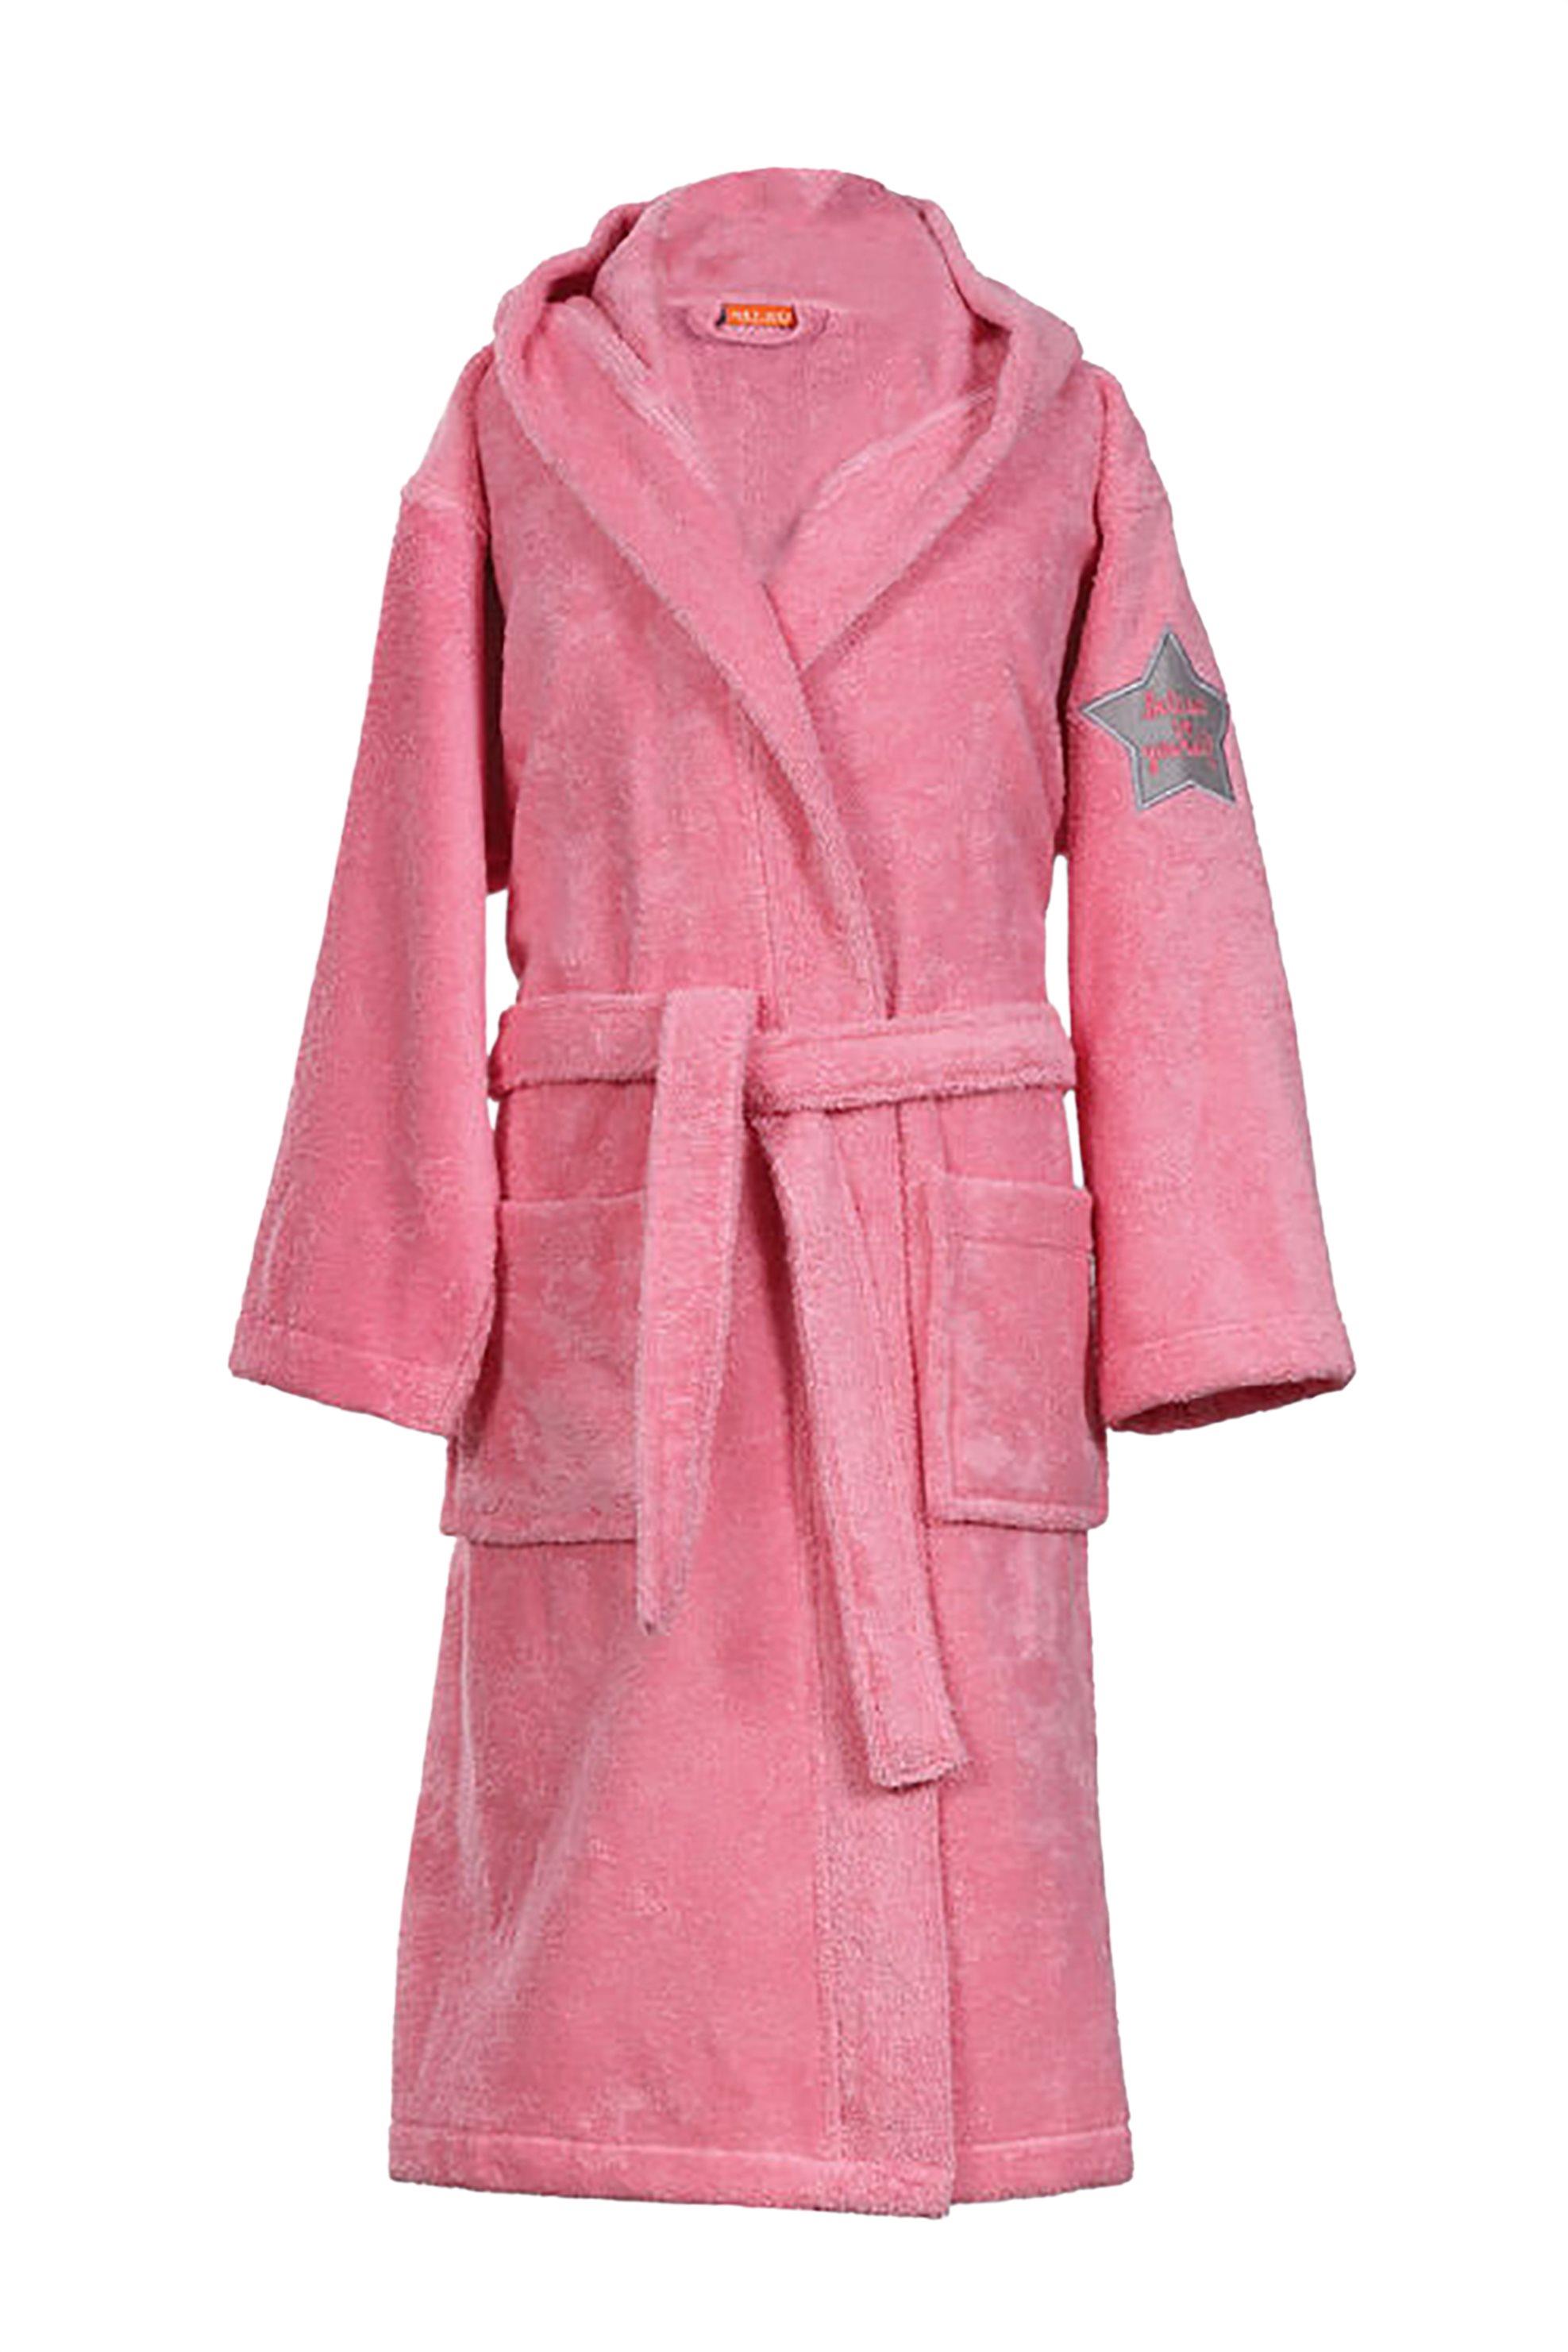 NEF-NEF Μπουρνούζι με κουκούλα μονόχρωμοJunior - 022692 - Ροζ home   παιδια   παιδικά μπουρνούζια   ρόμπες